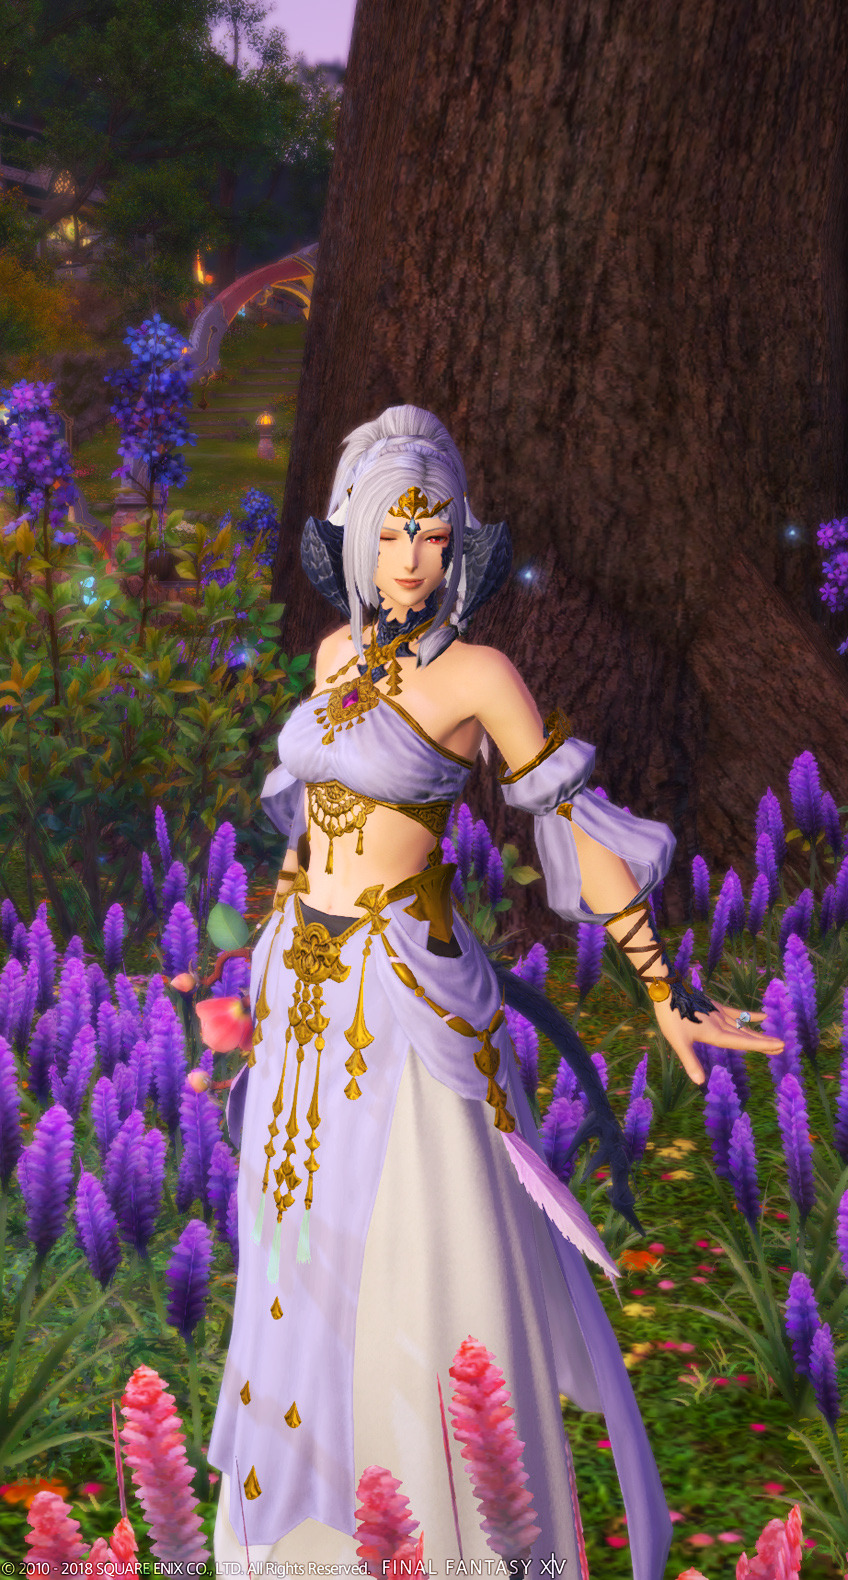 Gyr Abanian Plait Hairstyle - Final Fantasy XIV A Realm